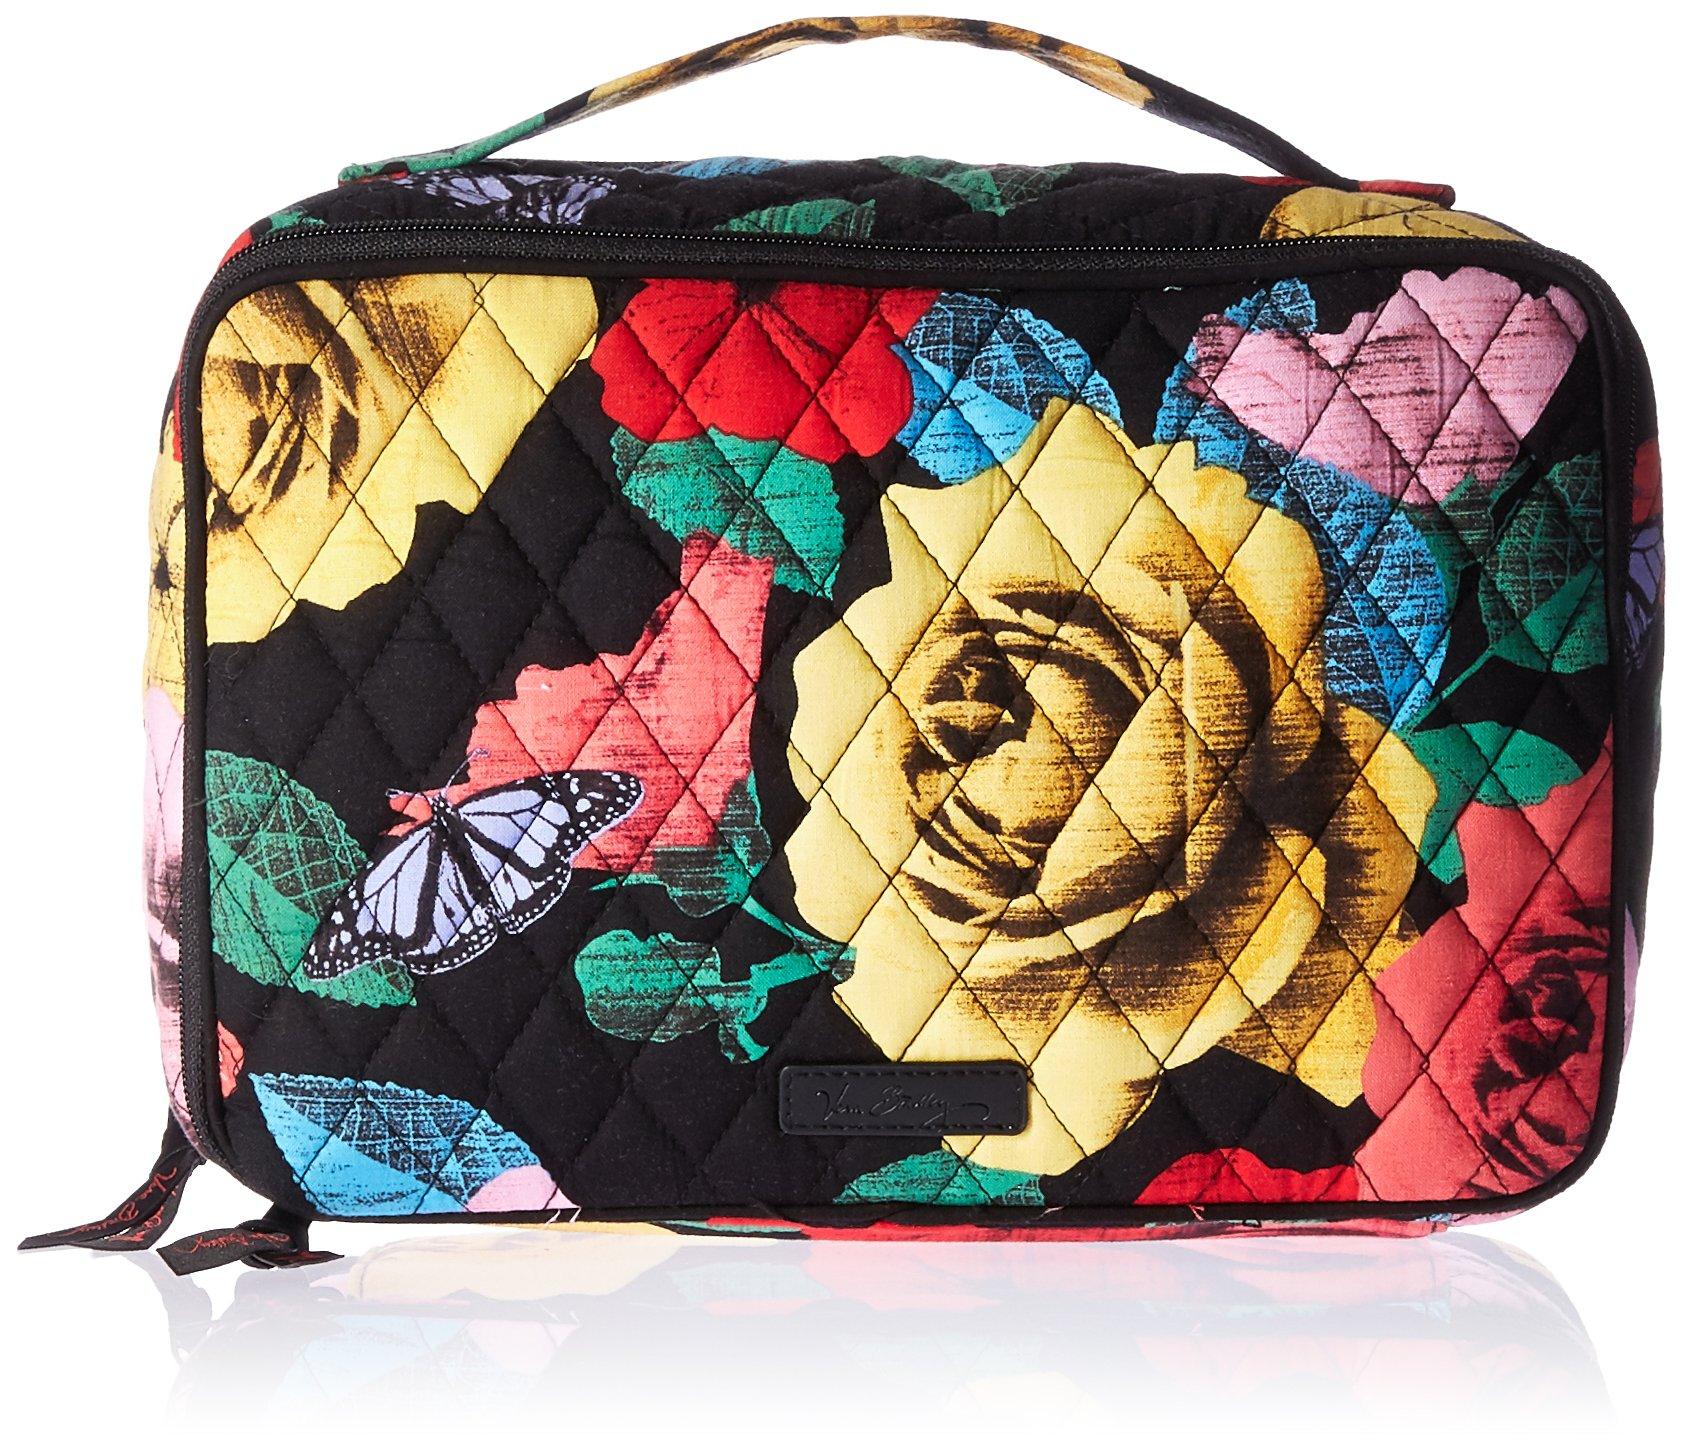 Vera Bradley Large Blush and Brush Makeup Case, Havana Rose